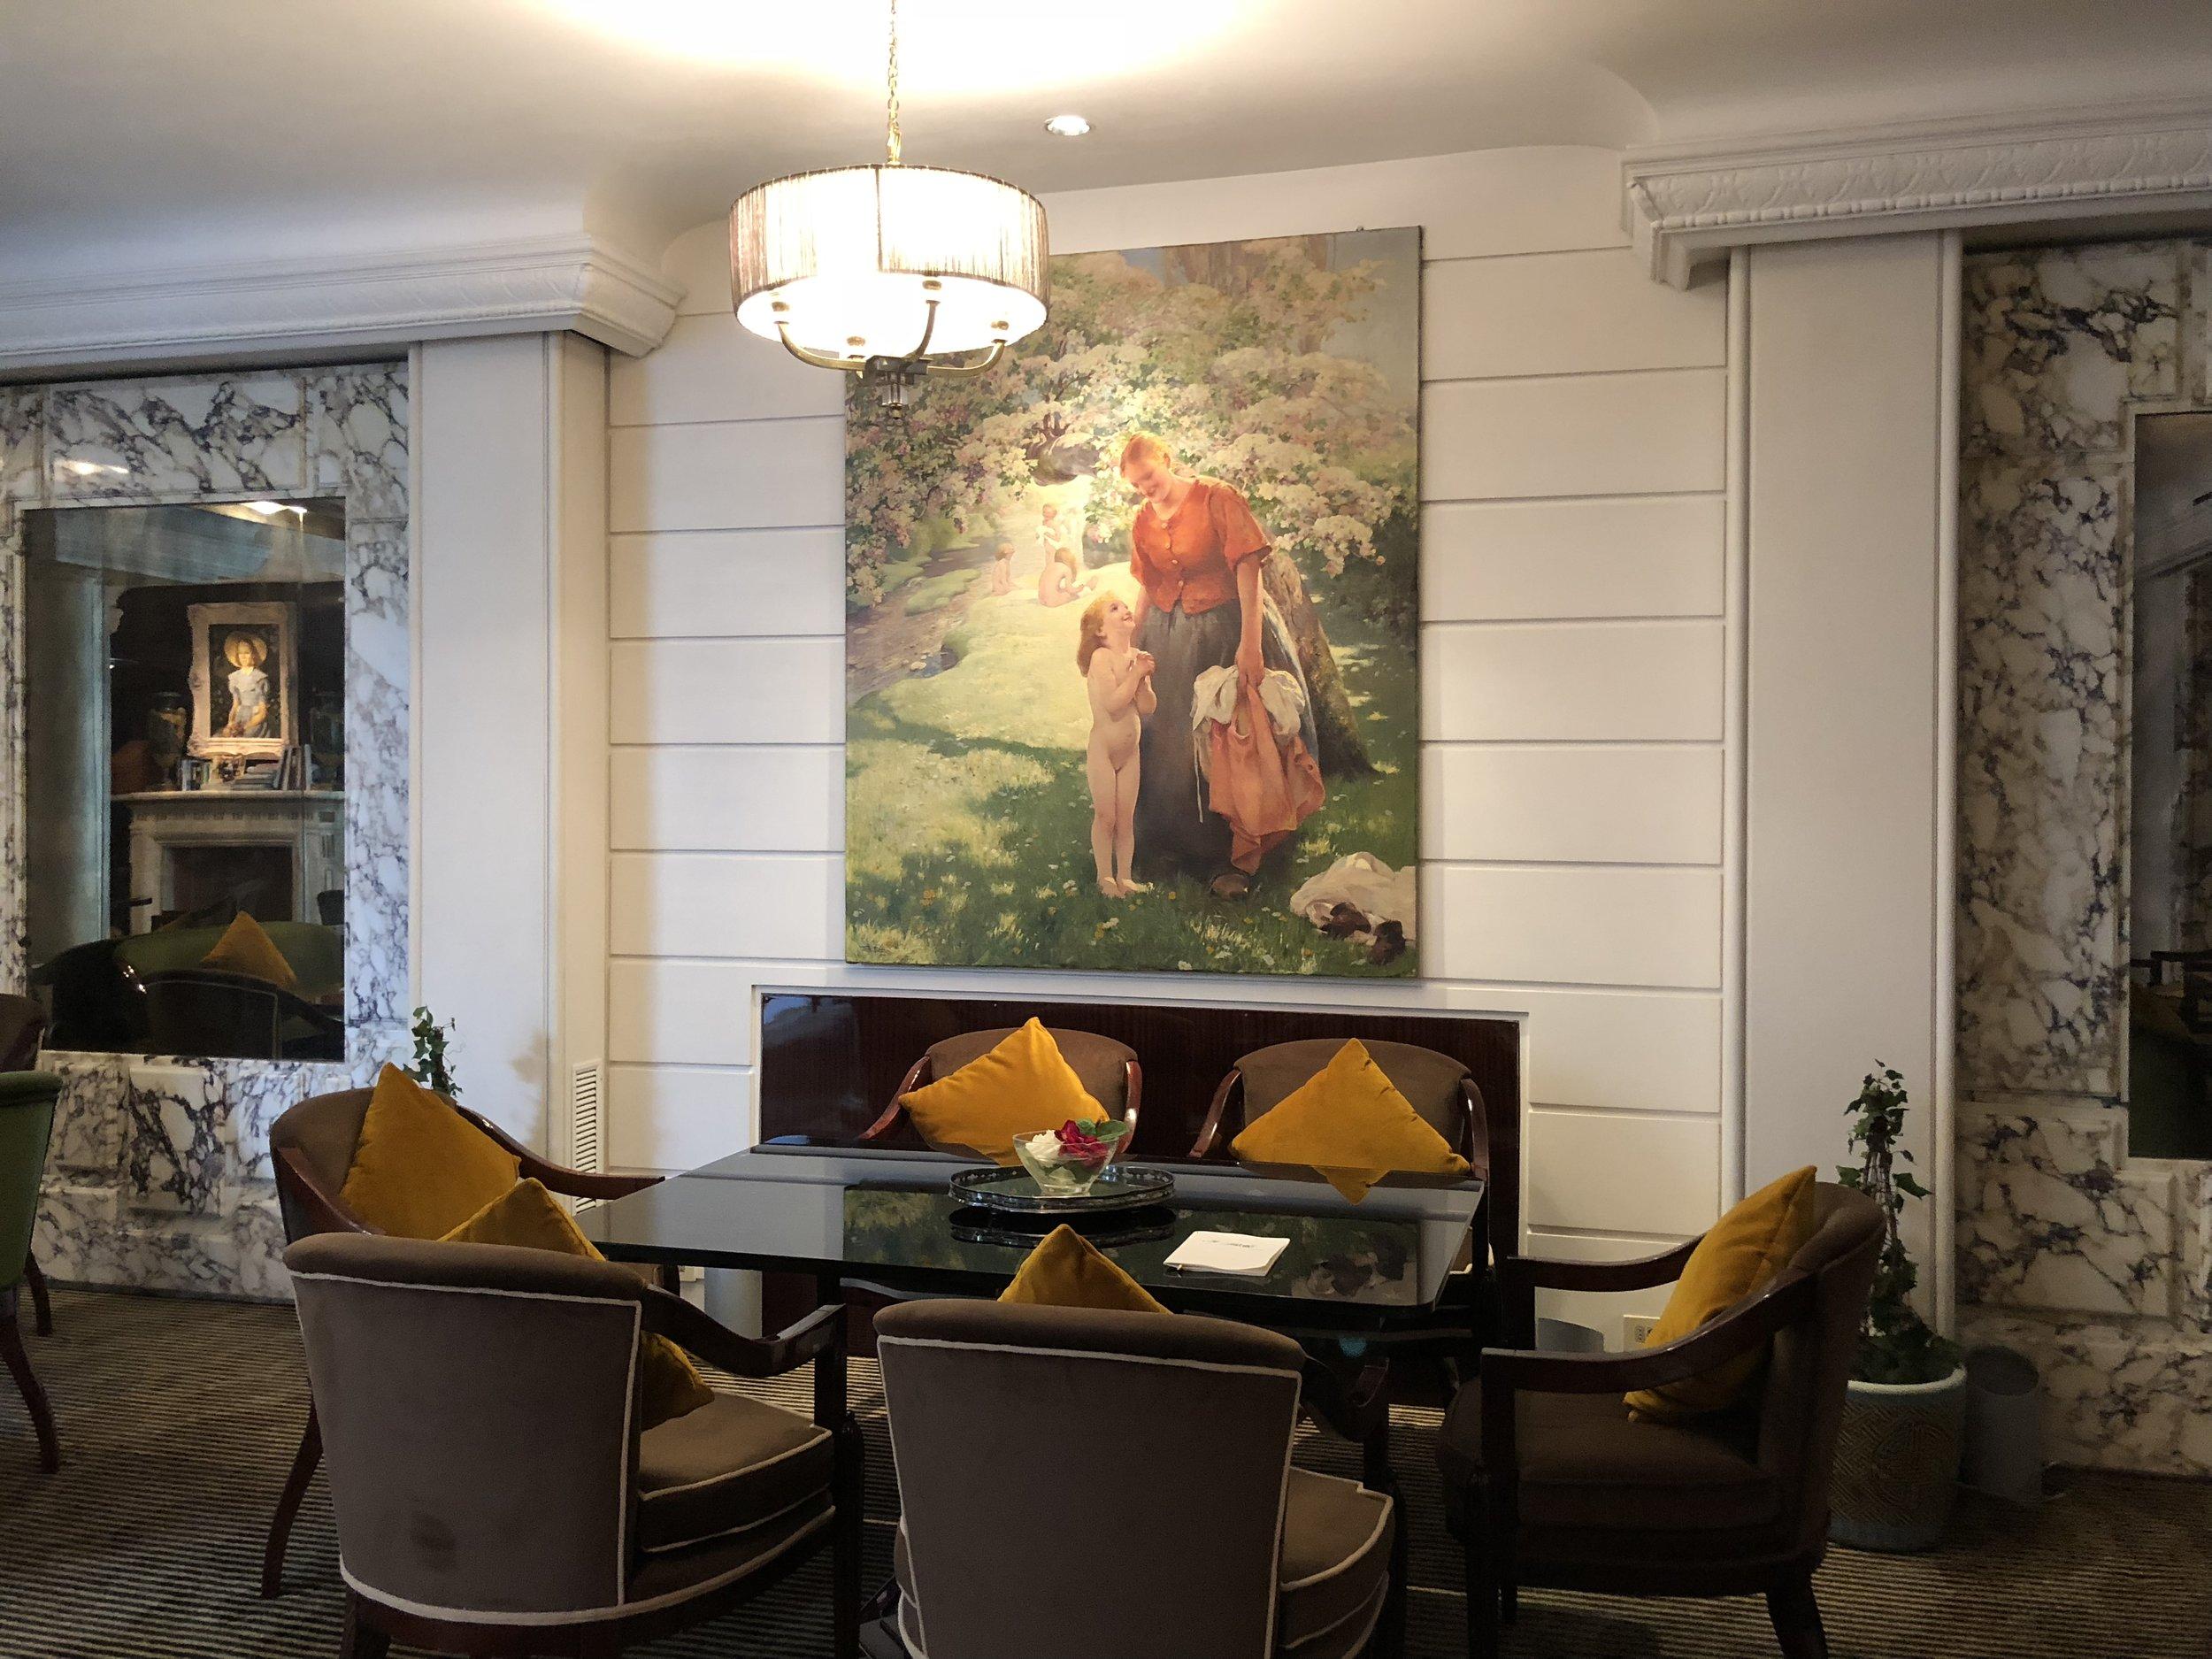 Sophisticated furnishings